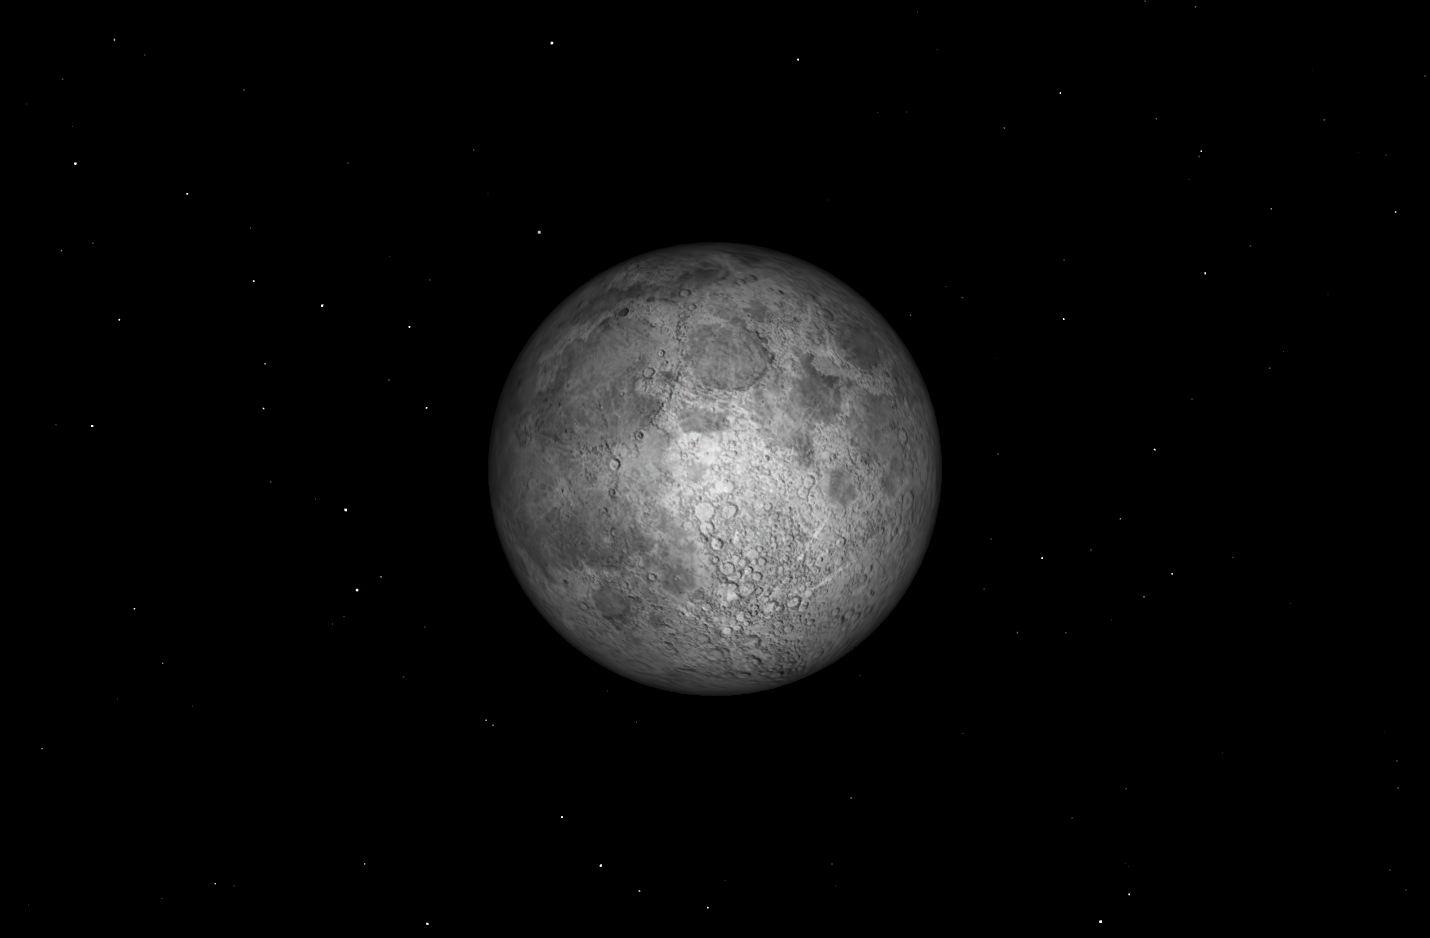 Full Moon, February 2016